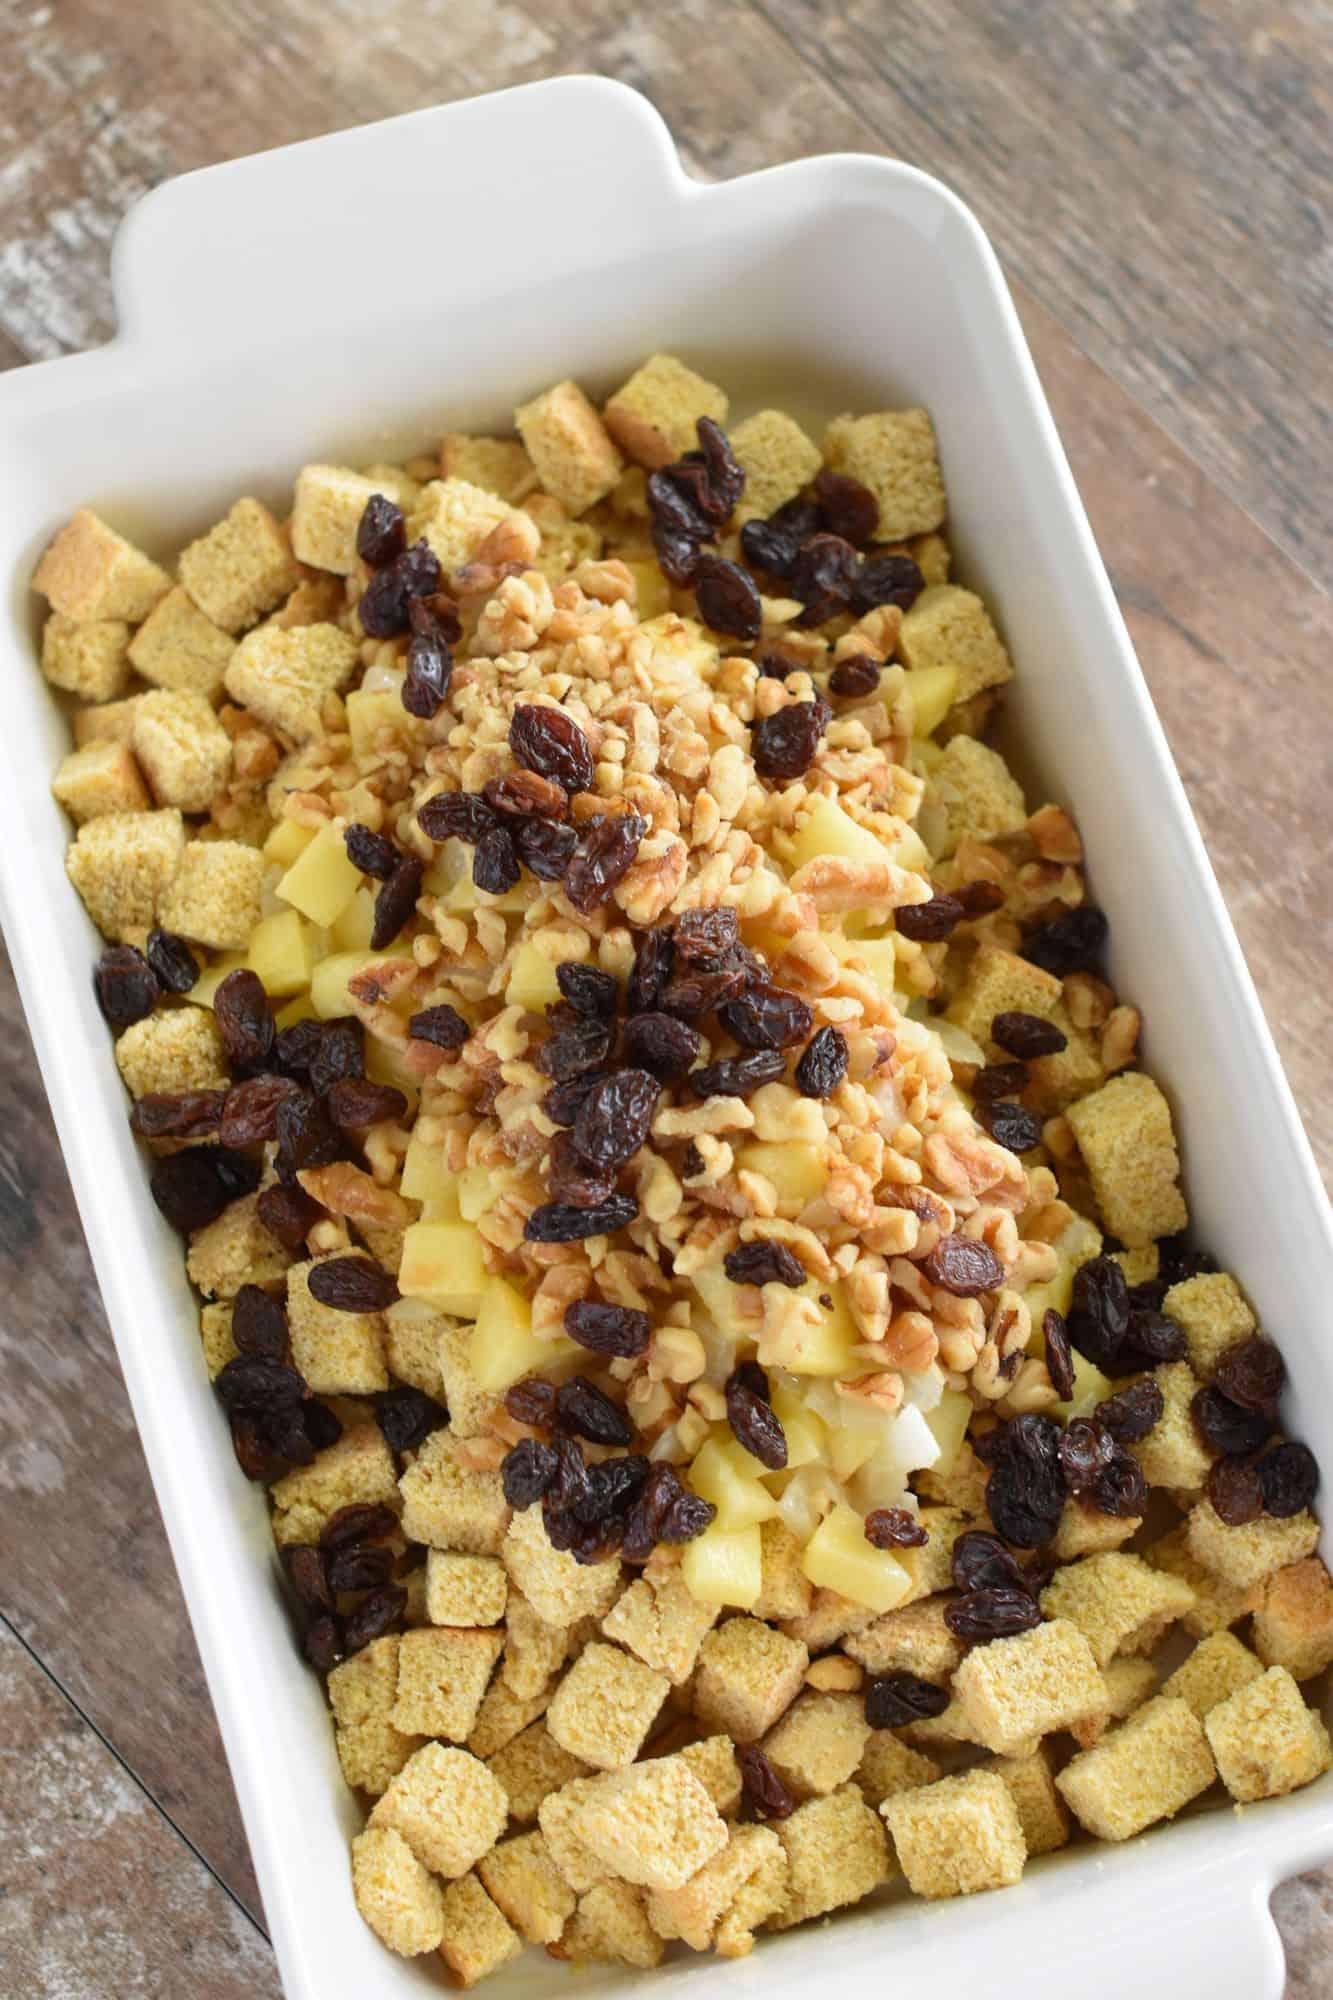 walnuts and raisins added to casserole dish